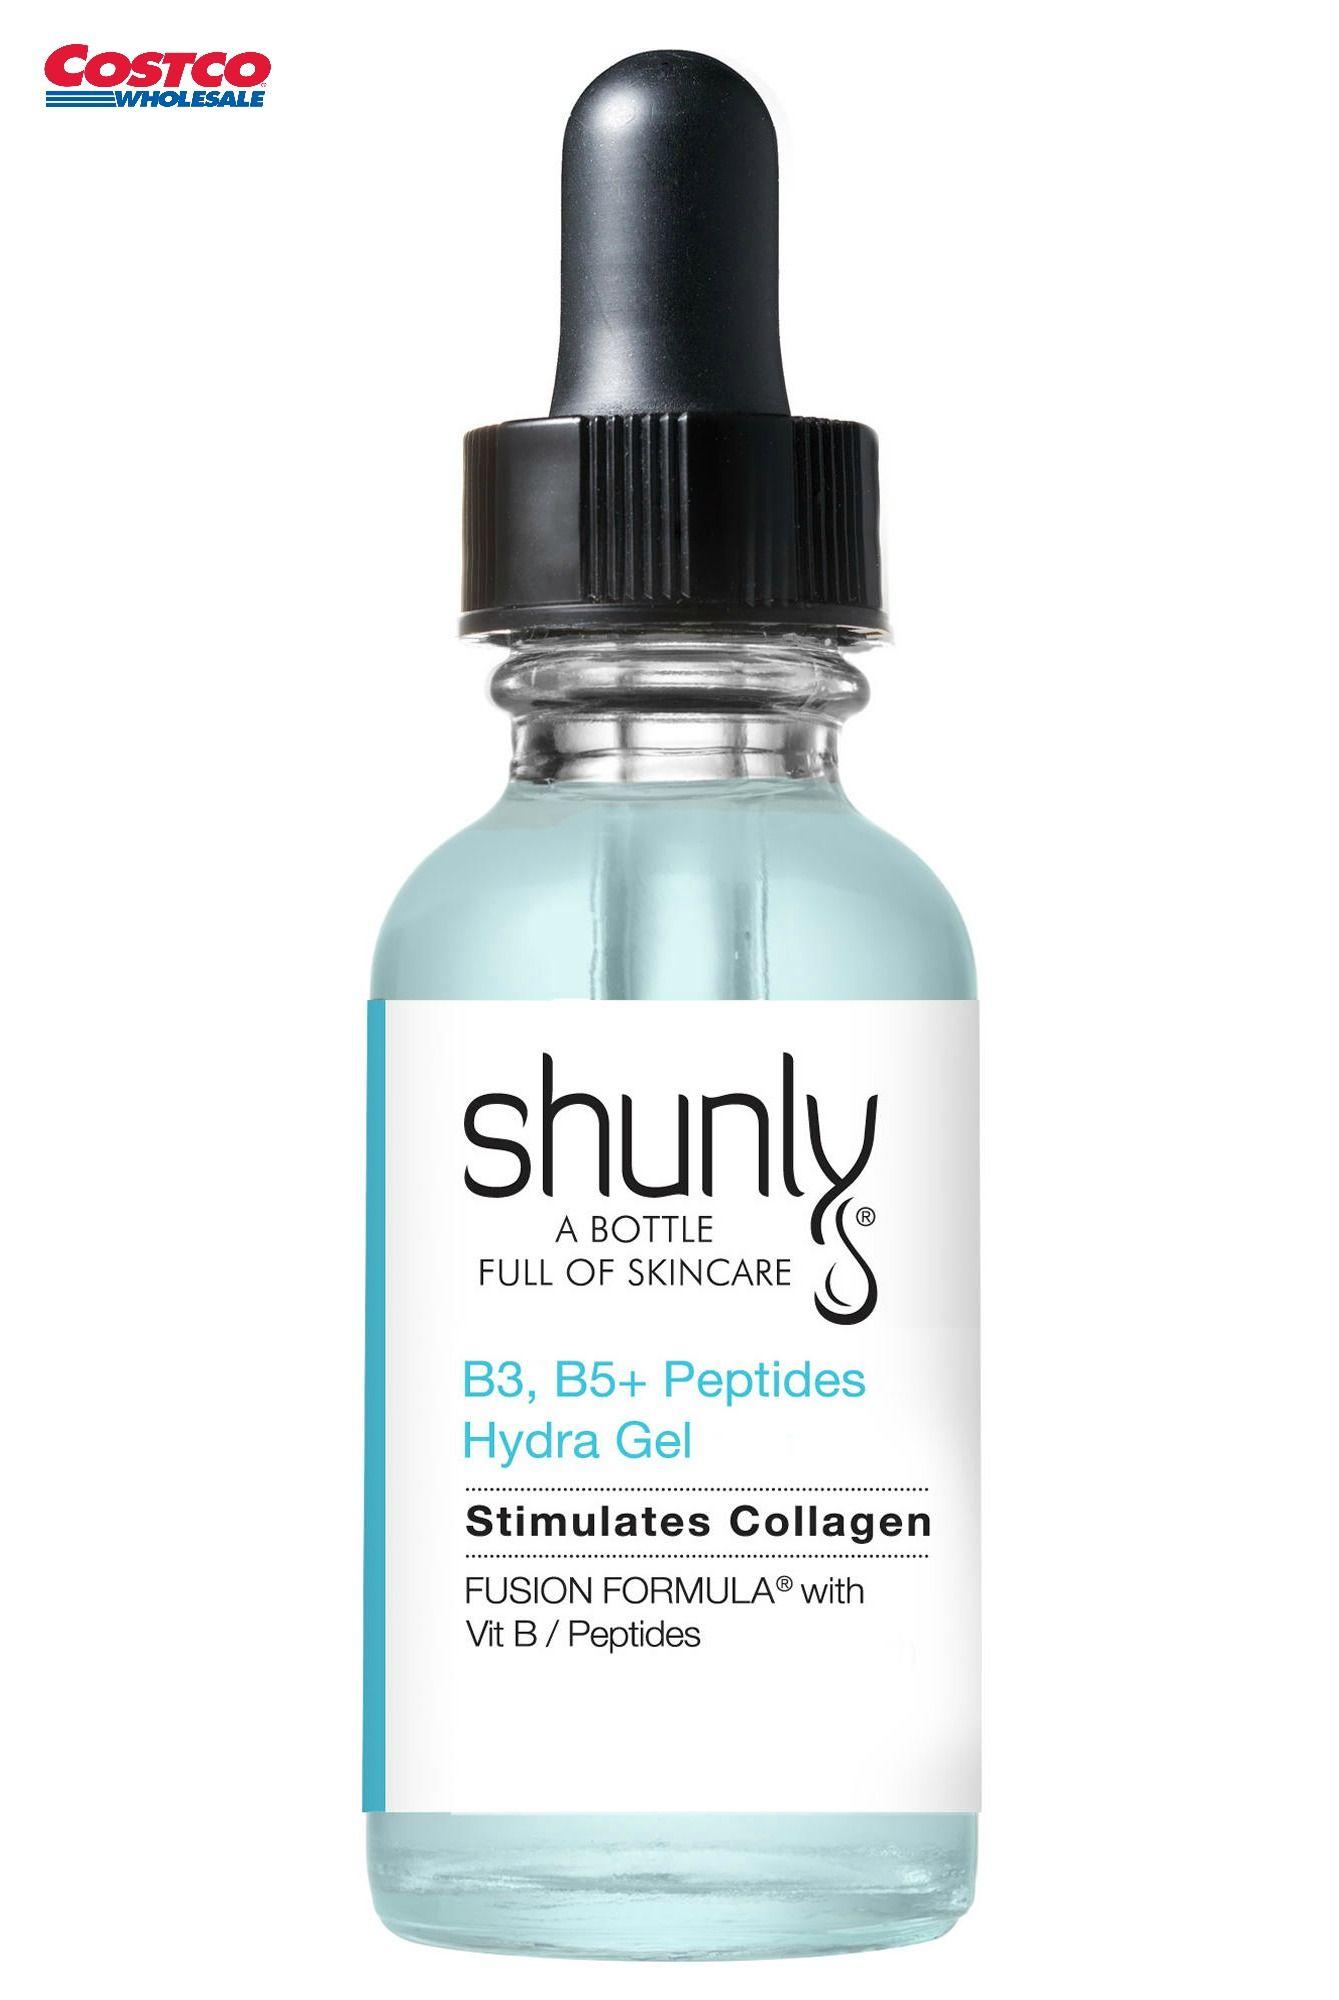 Shunly B3, B5 + Peptides Hydra Gel 48.99 Beauty skin